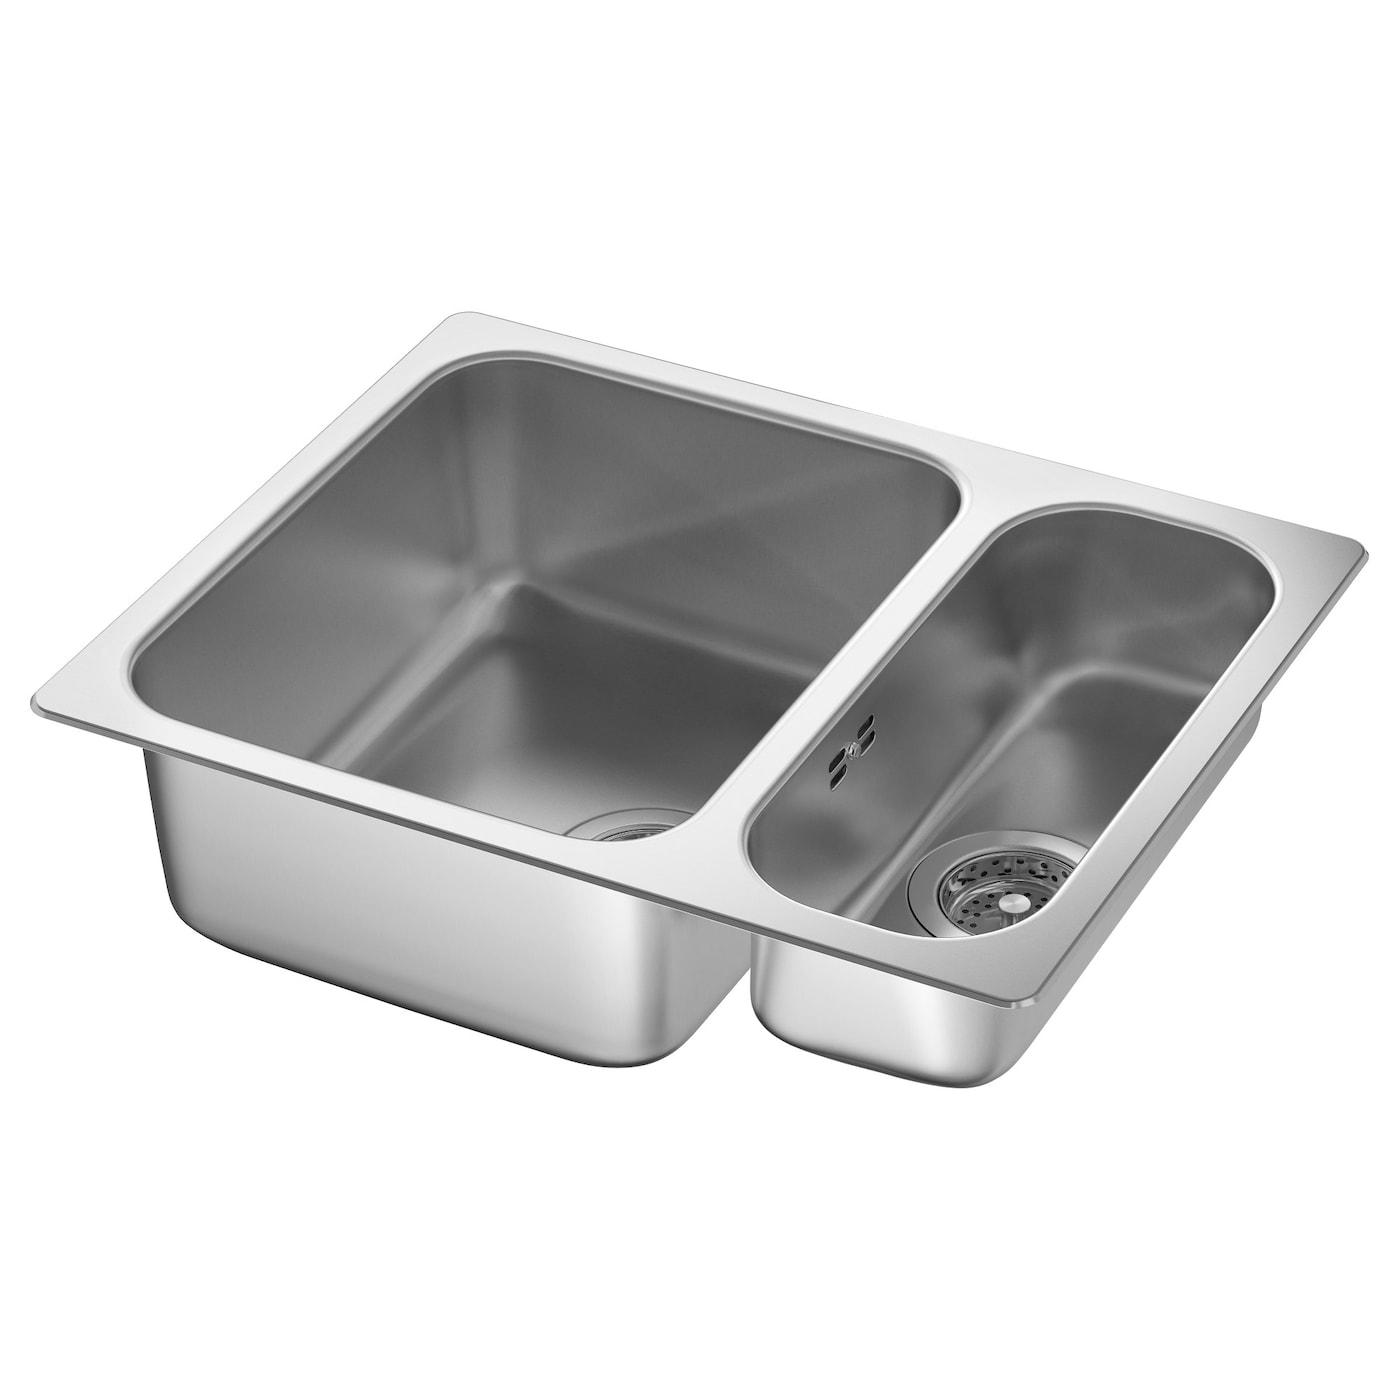 Stainless Steel Sinks Ireland : IKEA HILLESJ?N inset sink 1 1/2 bowl